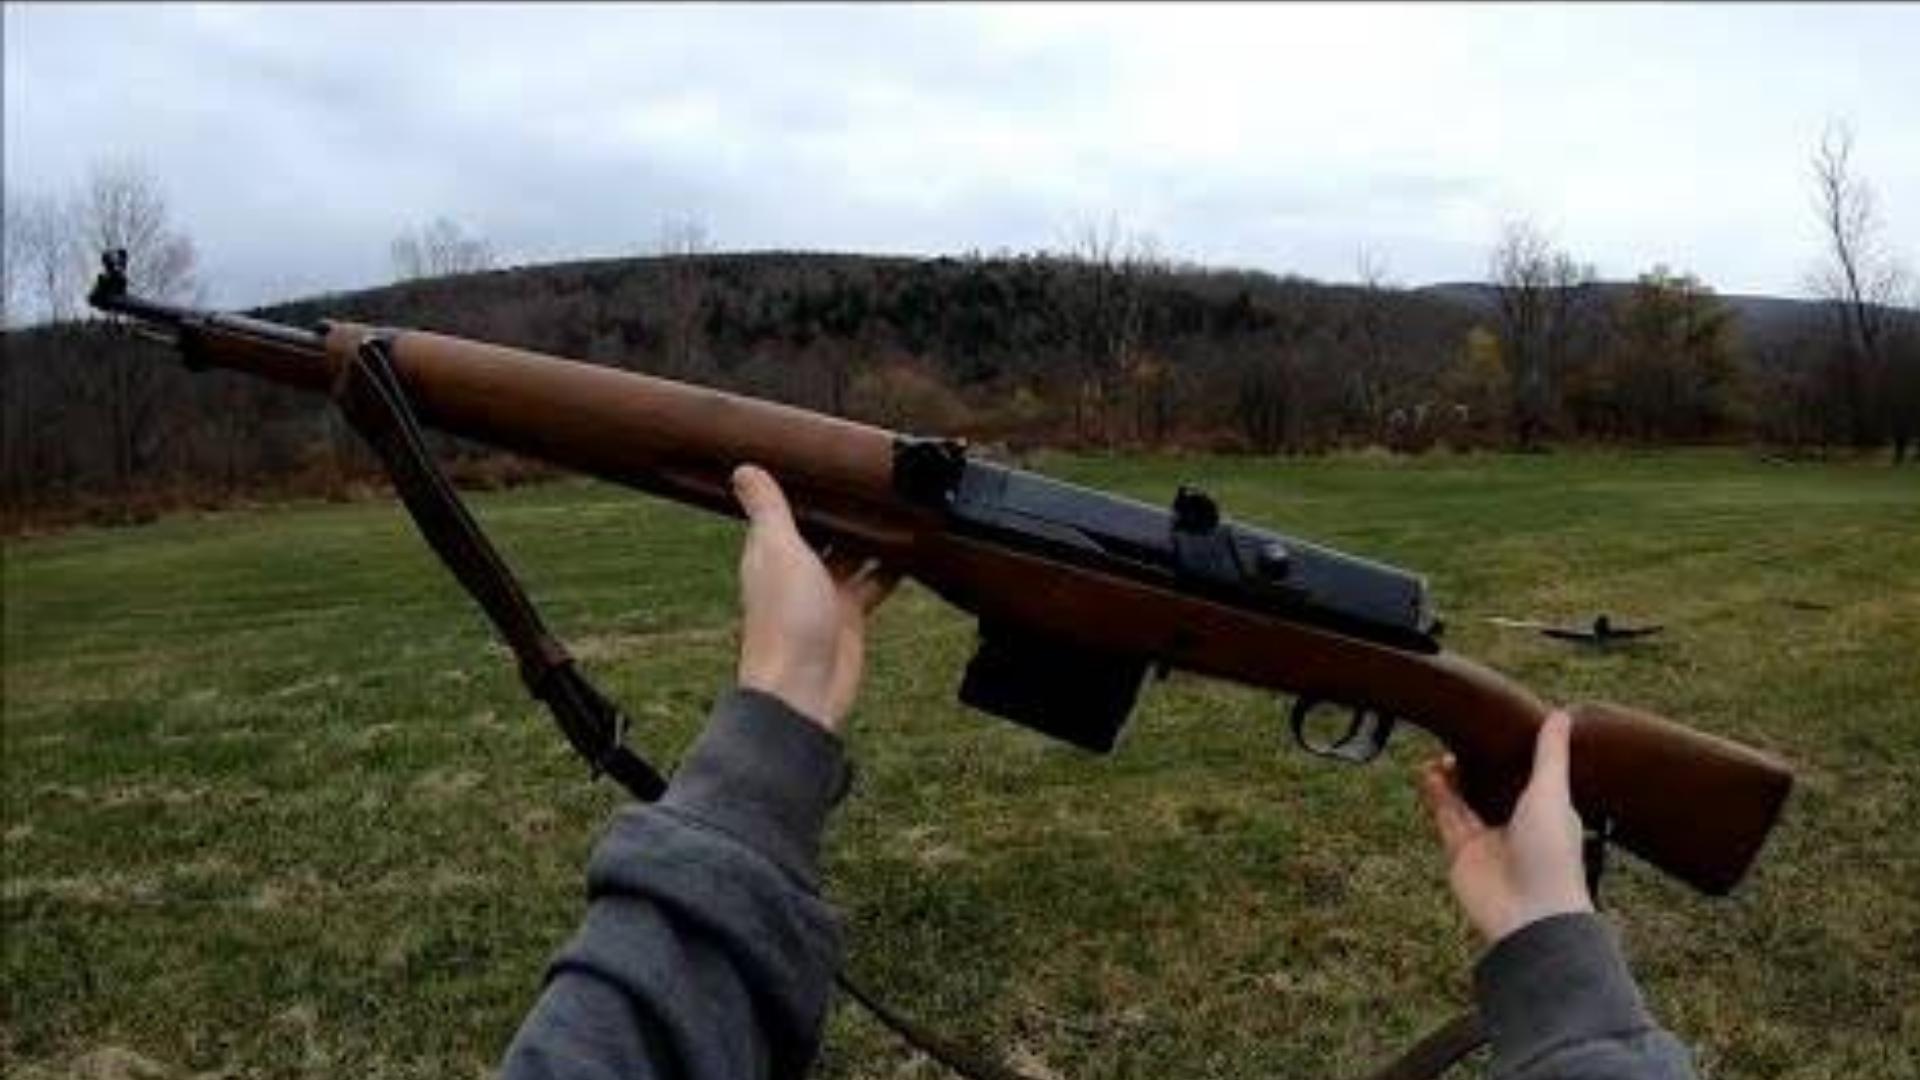 [GunsOfTheWorld]近看射击瑞典AG M/42B 半自动步枪